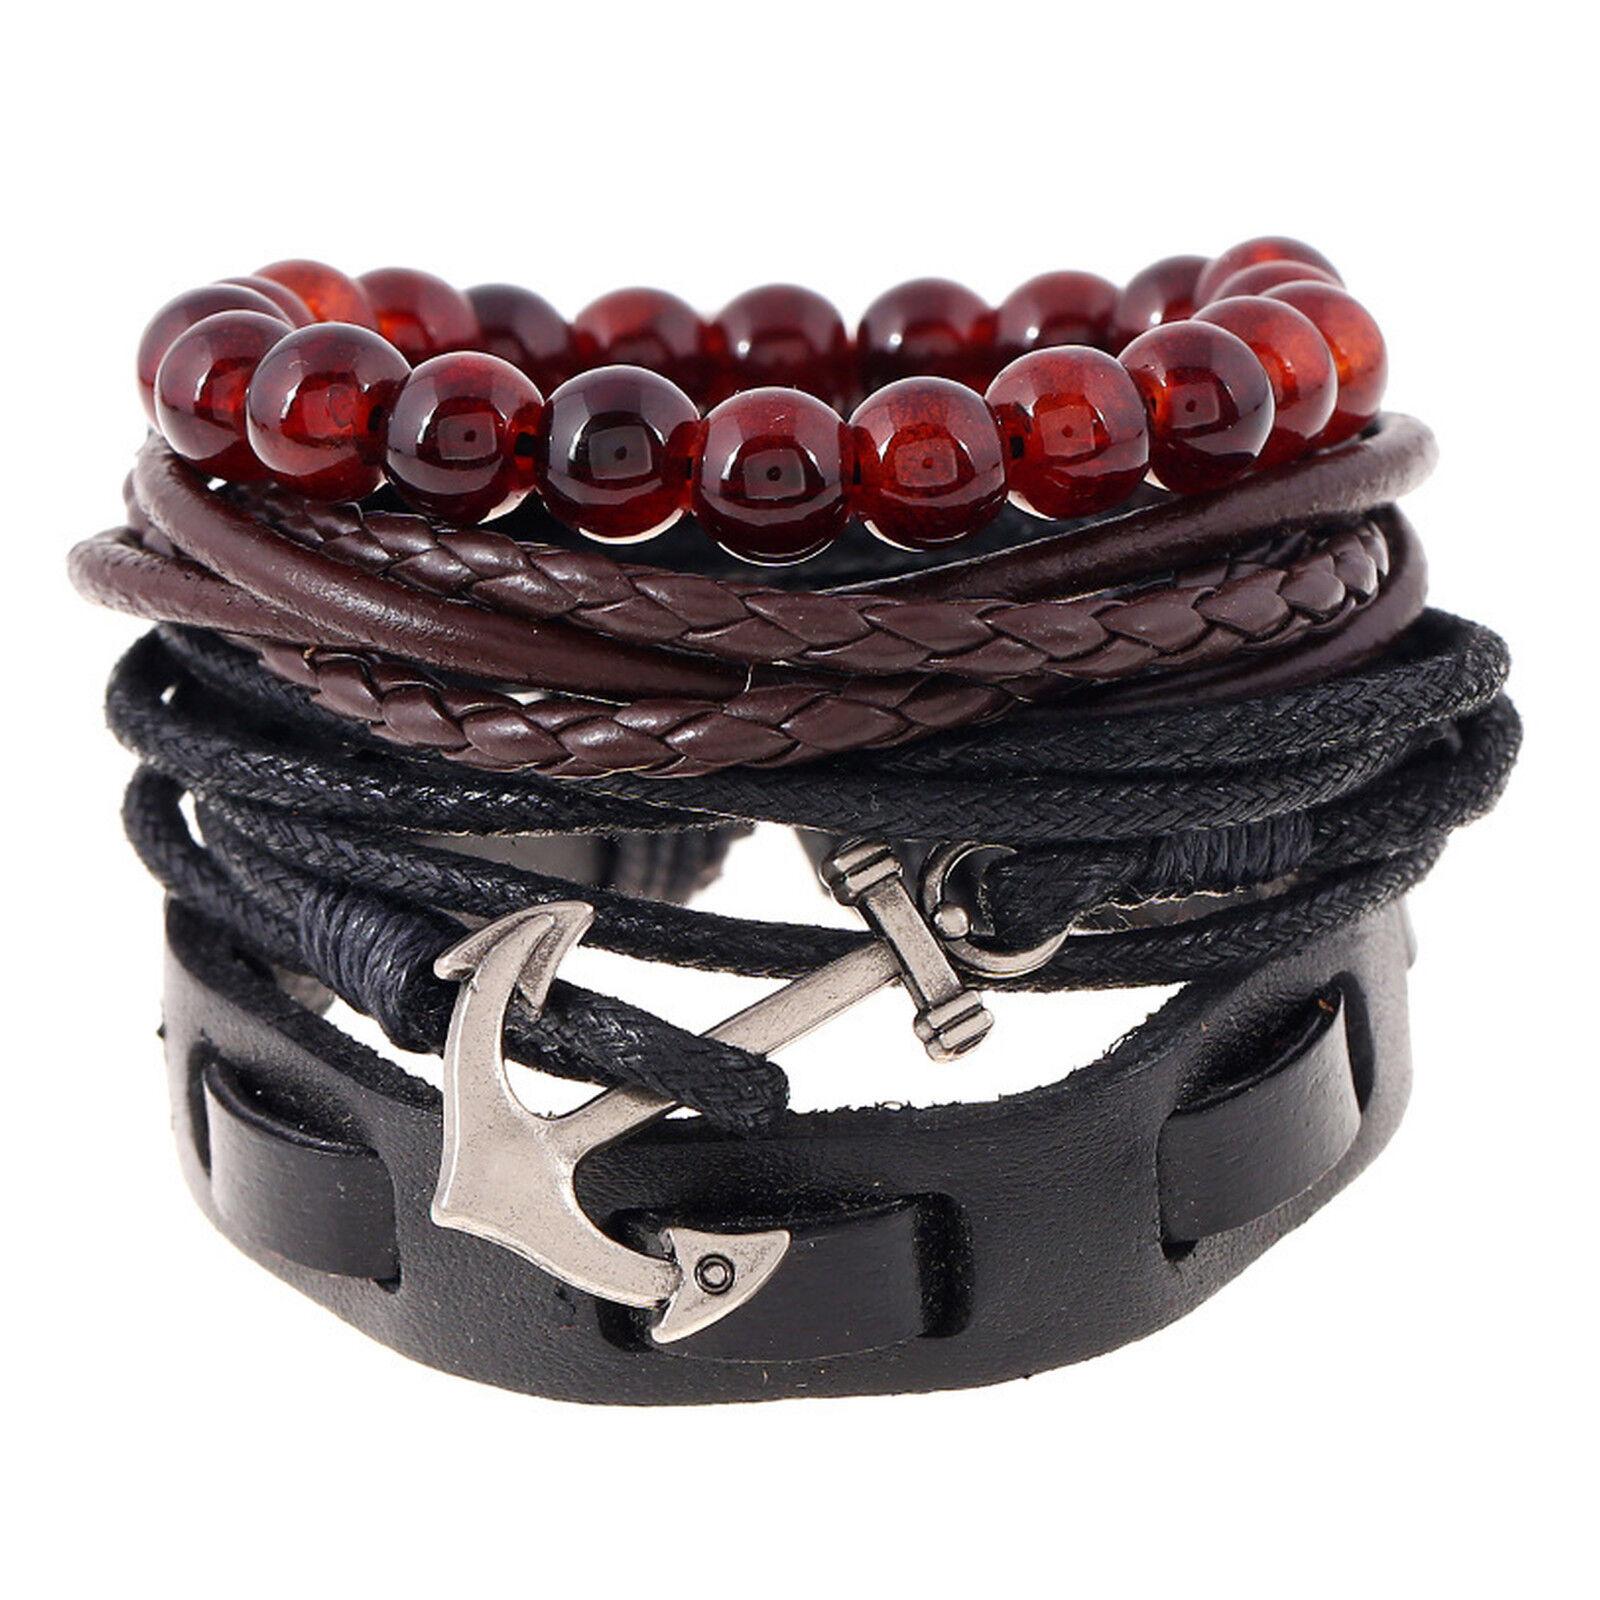 Men's Anchor and Tribal Wood Beads Leather Wristband Bracelet 4pcs Set Bracelets